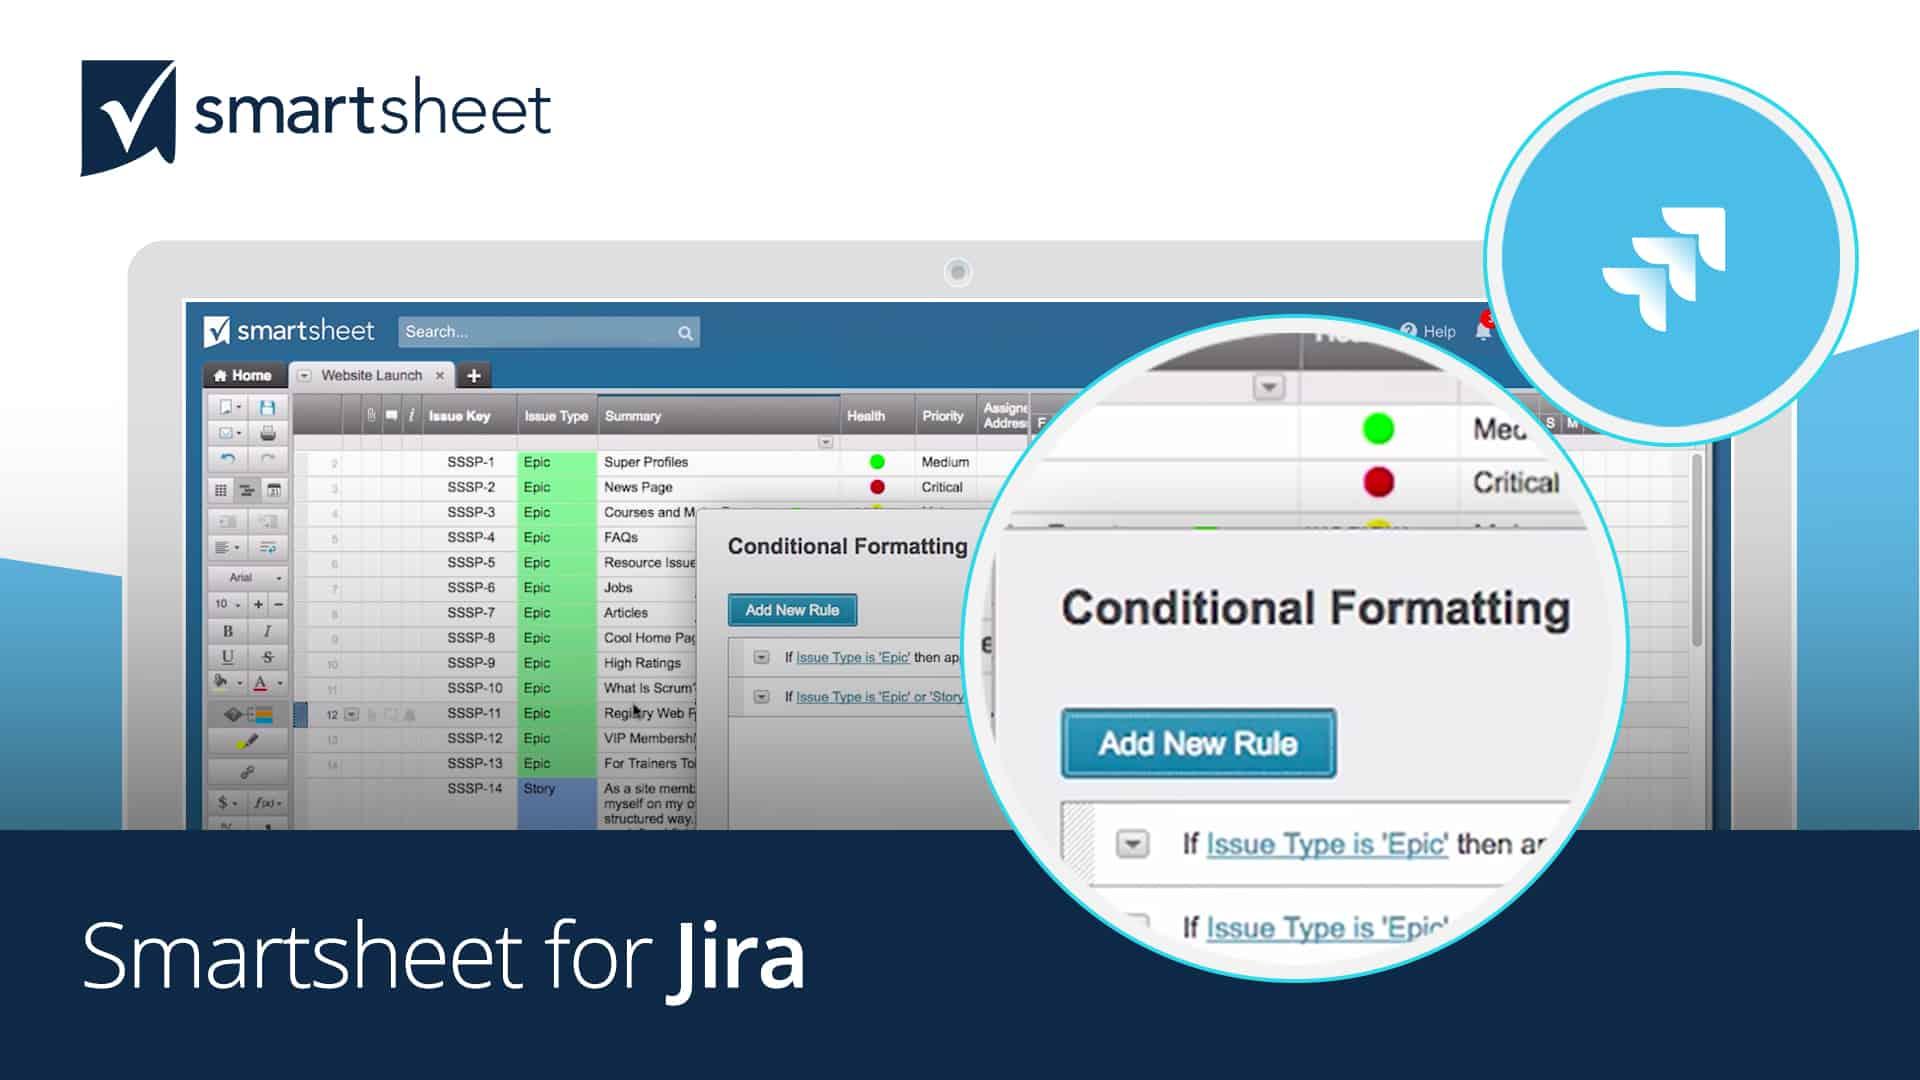 smartsheet for jira tutorial